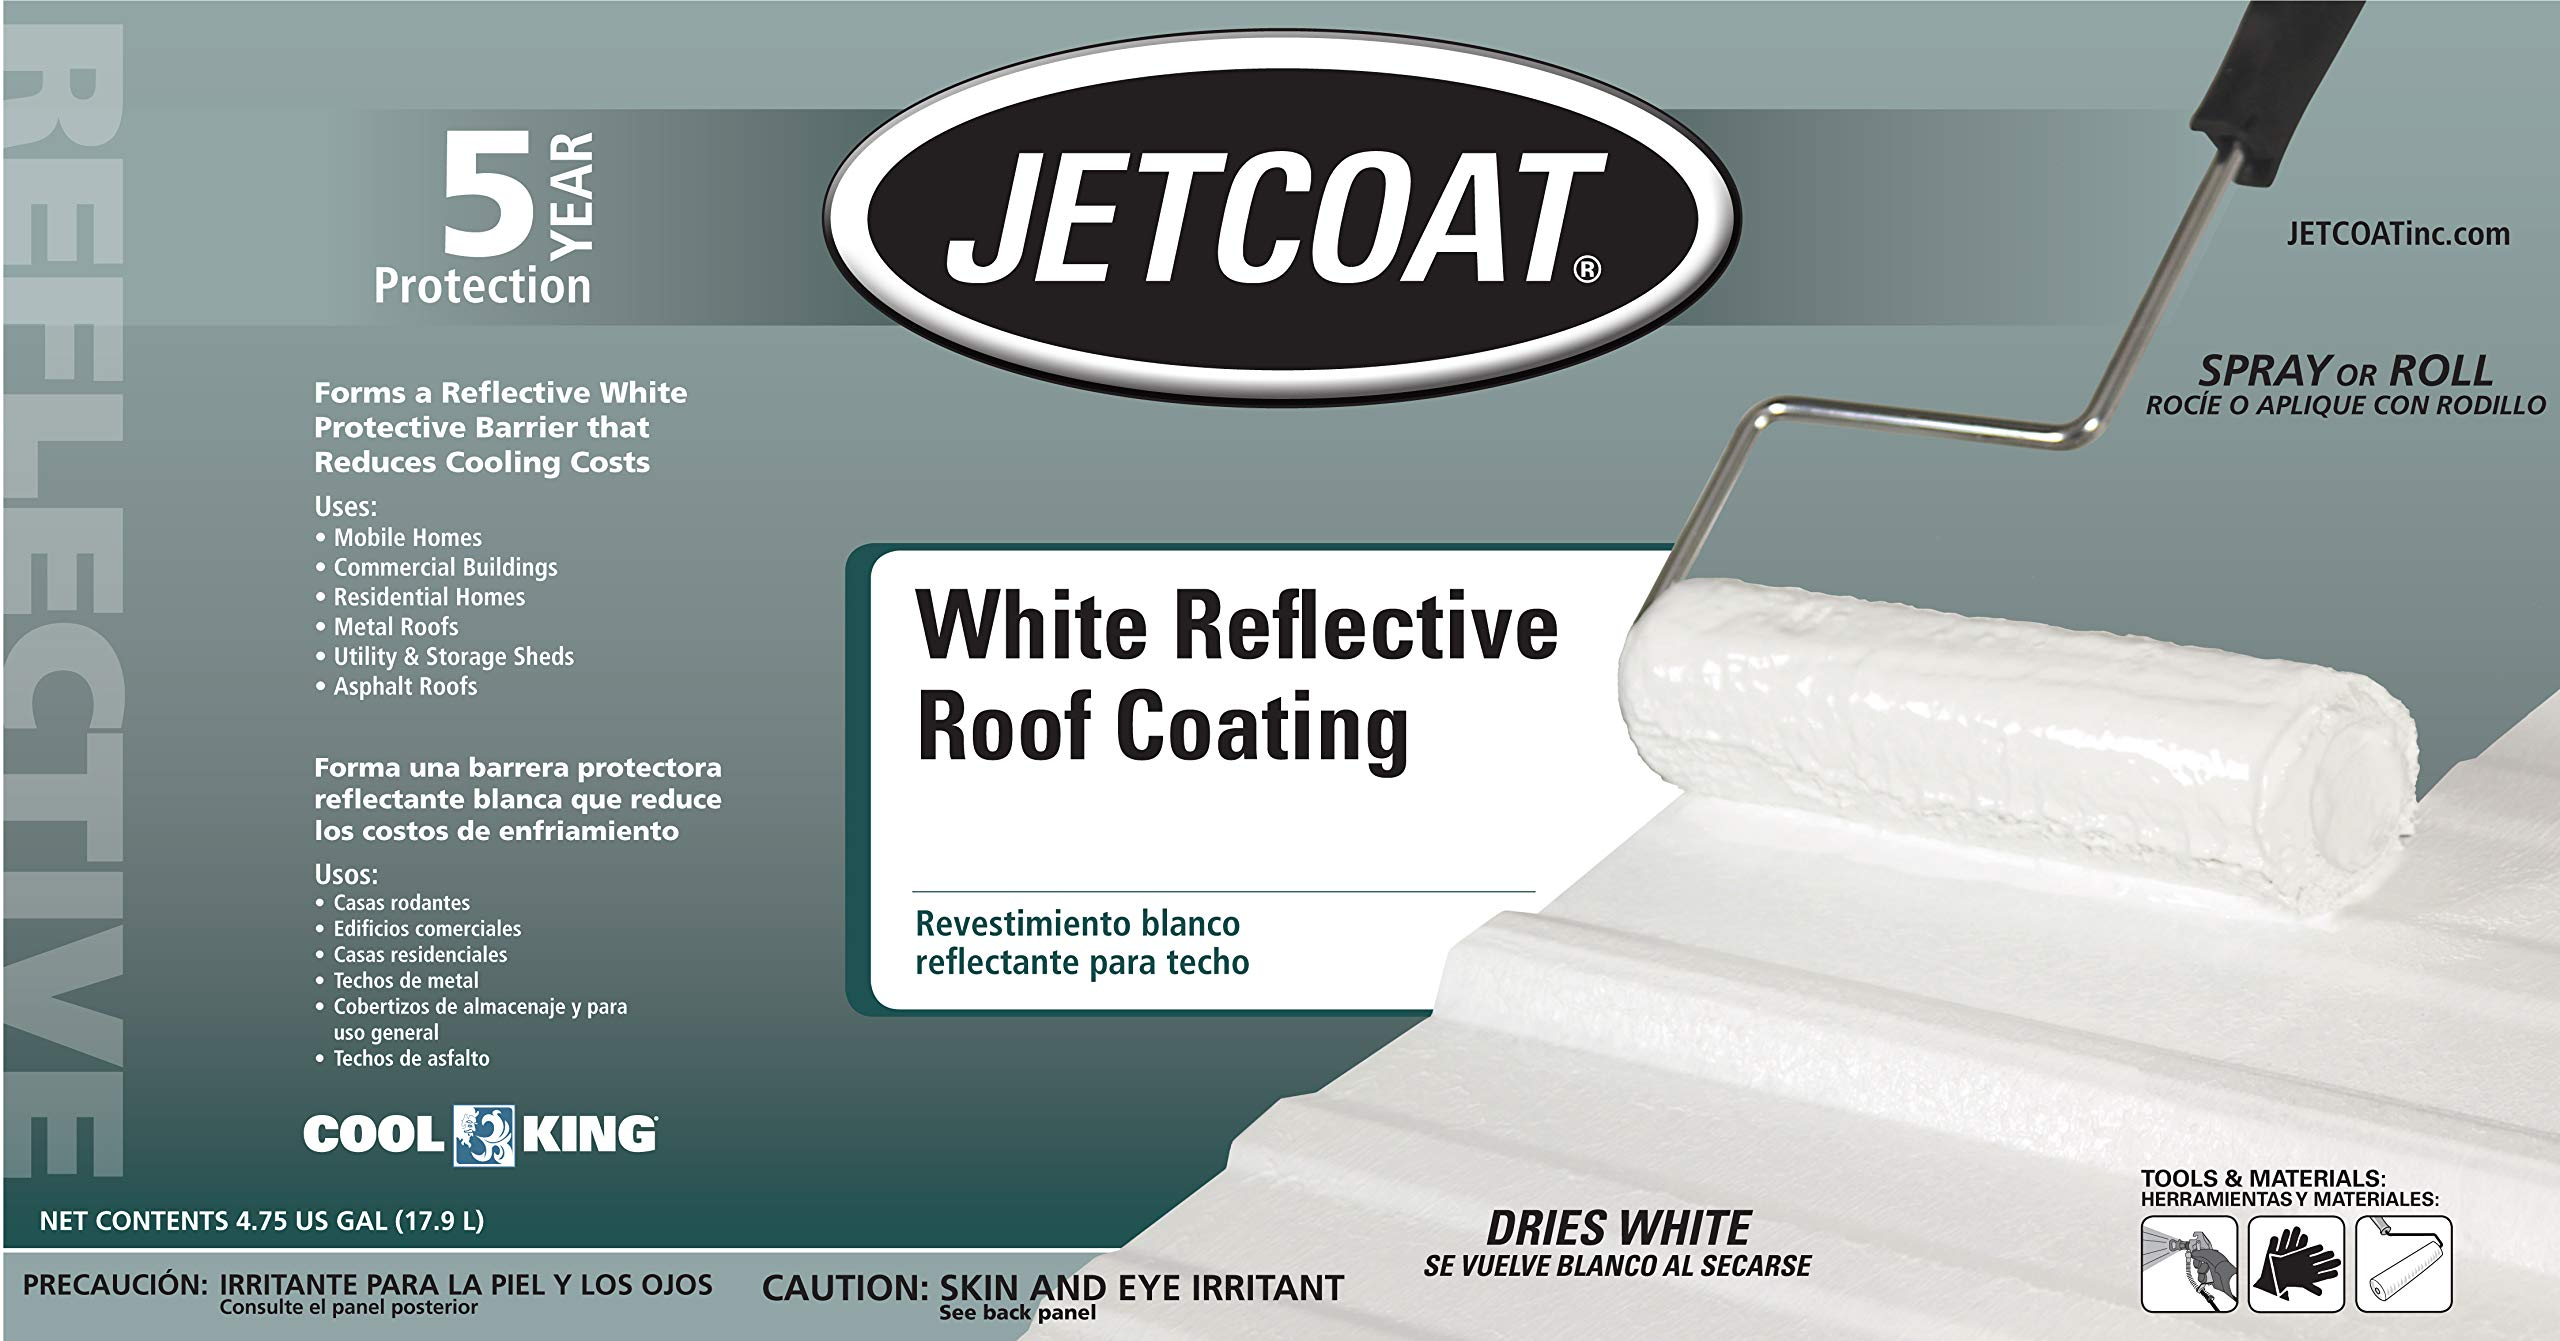 Jetcoat Cool King Elastomeric Acrylic Reflective Roof Coating, White, 5 Gallon, 5 Year Protection by Jetcoat (Image #4)